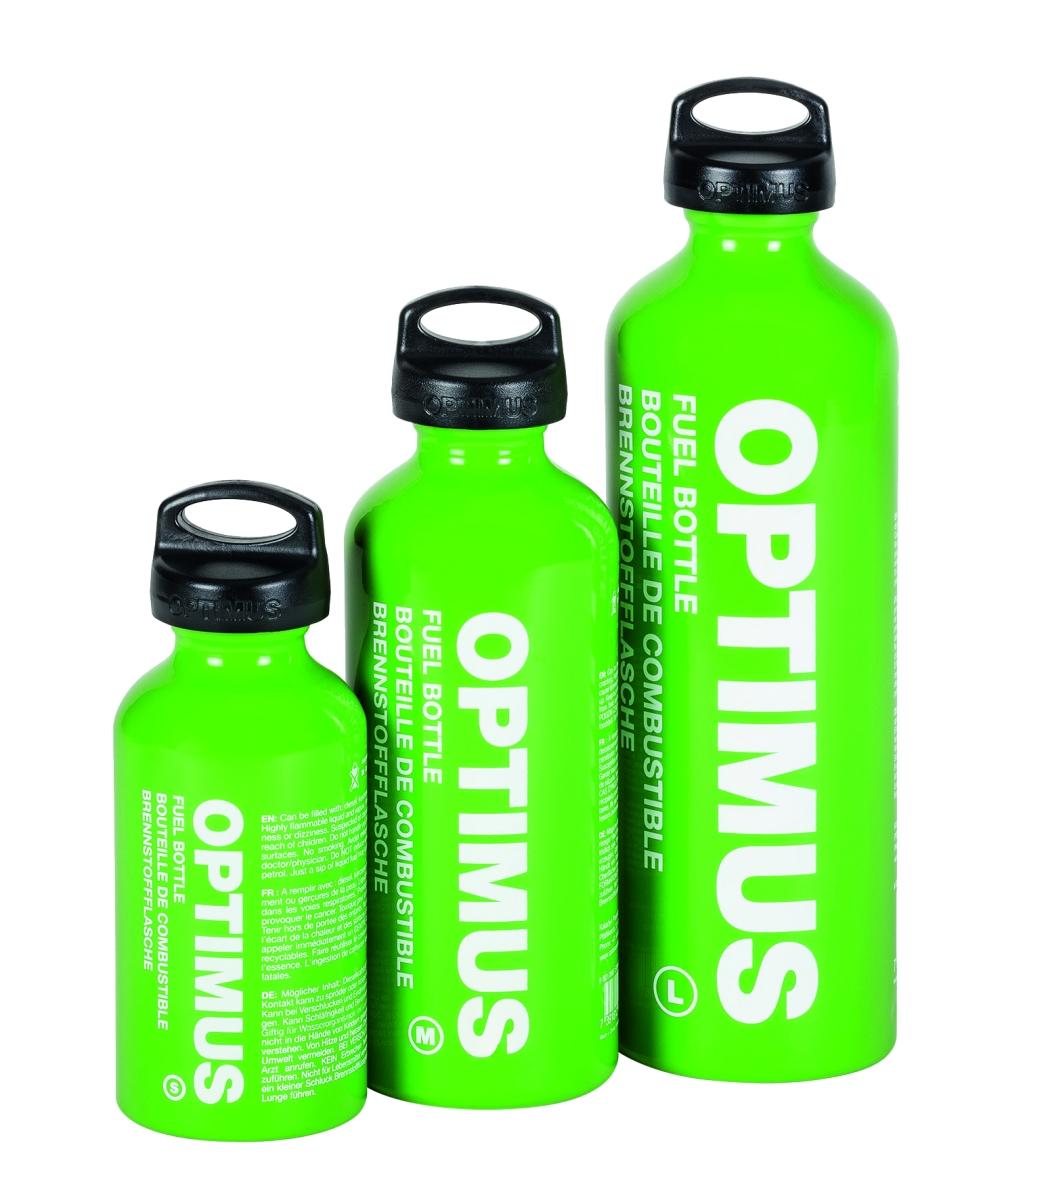 Optimus Brennstoff-Flasche L - 1,0 l